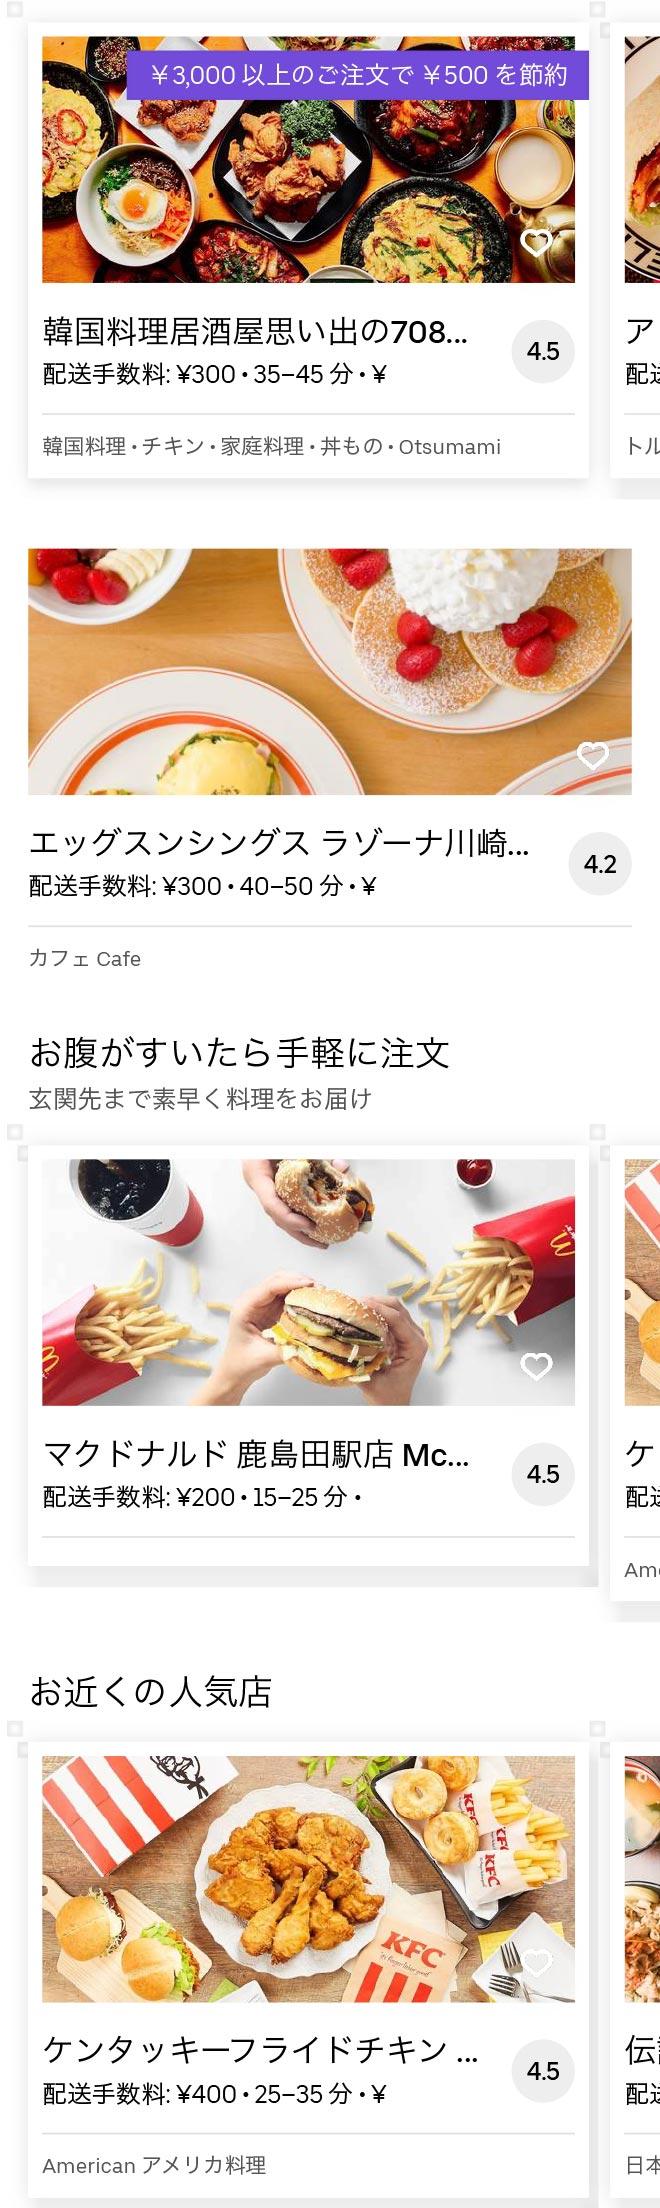 Shin kawasaki menu 2004 01